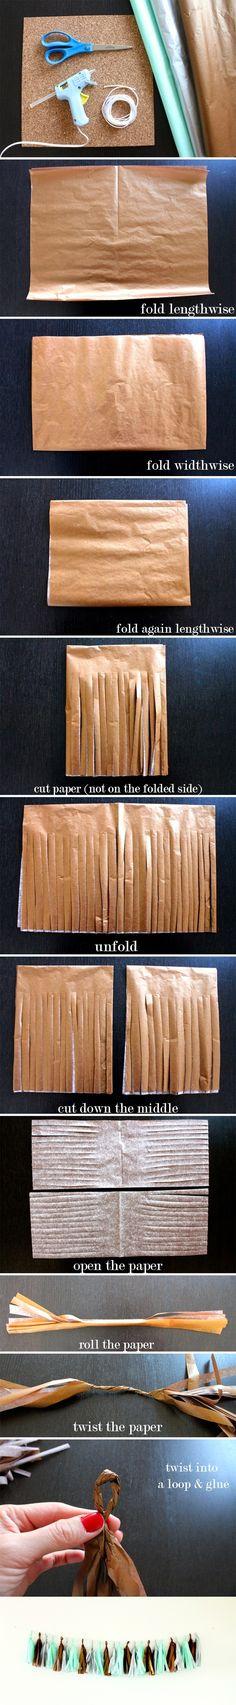 DIY : How to make a Tissue Paper Tassel Garland by naida